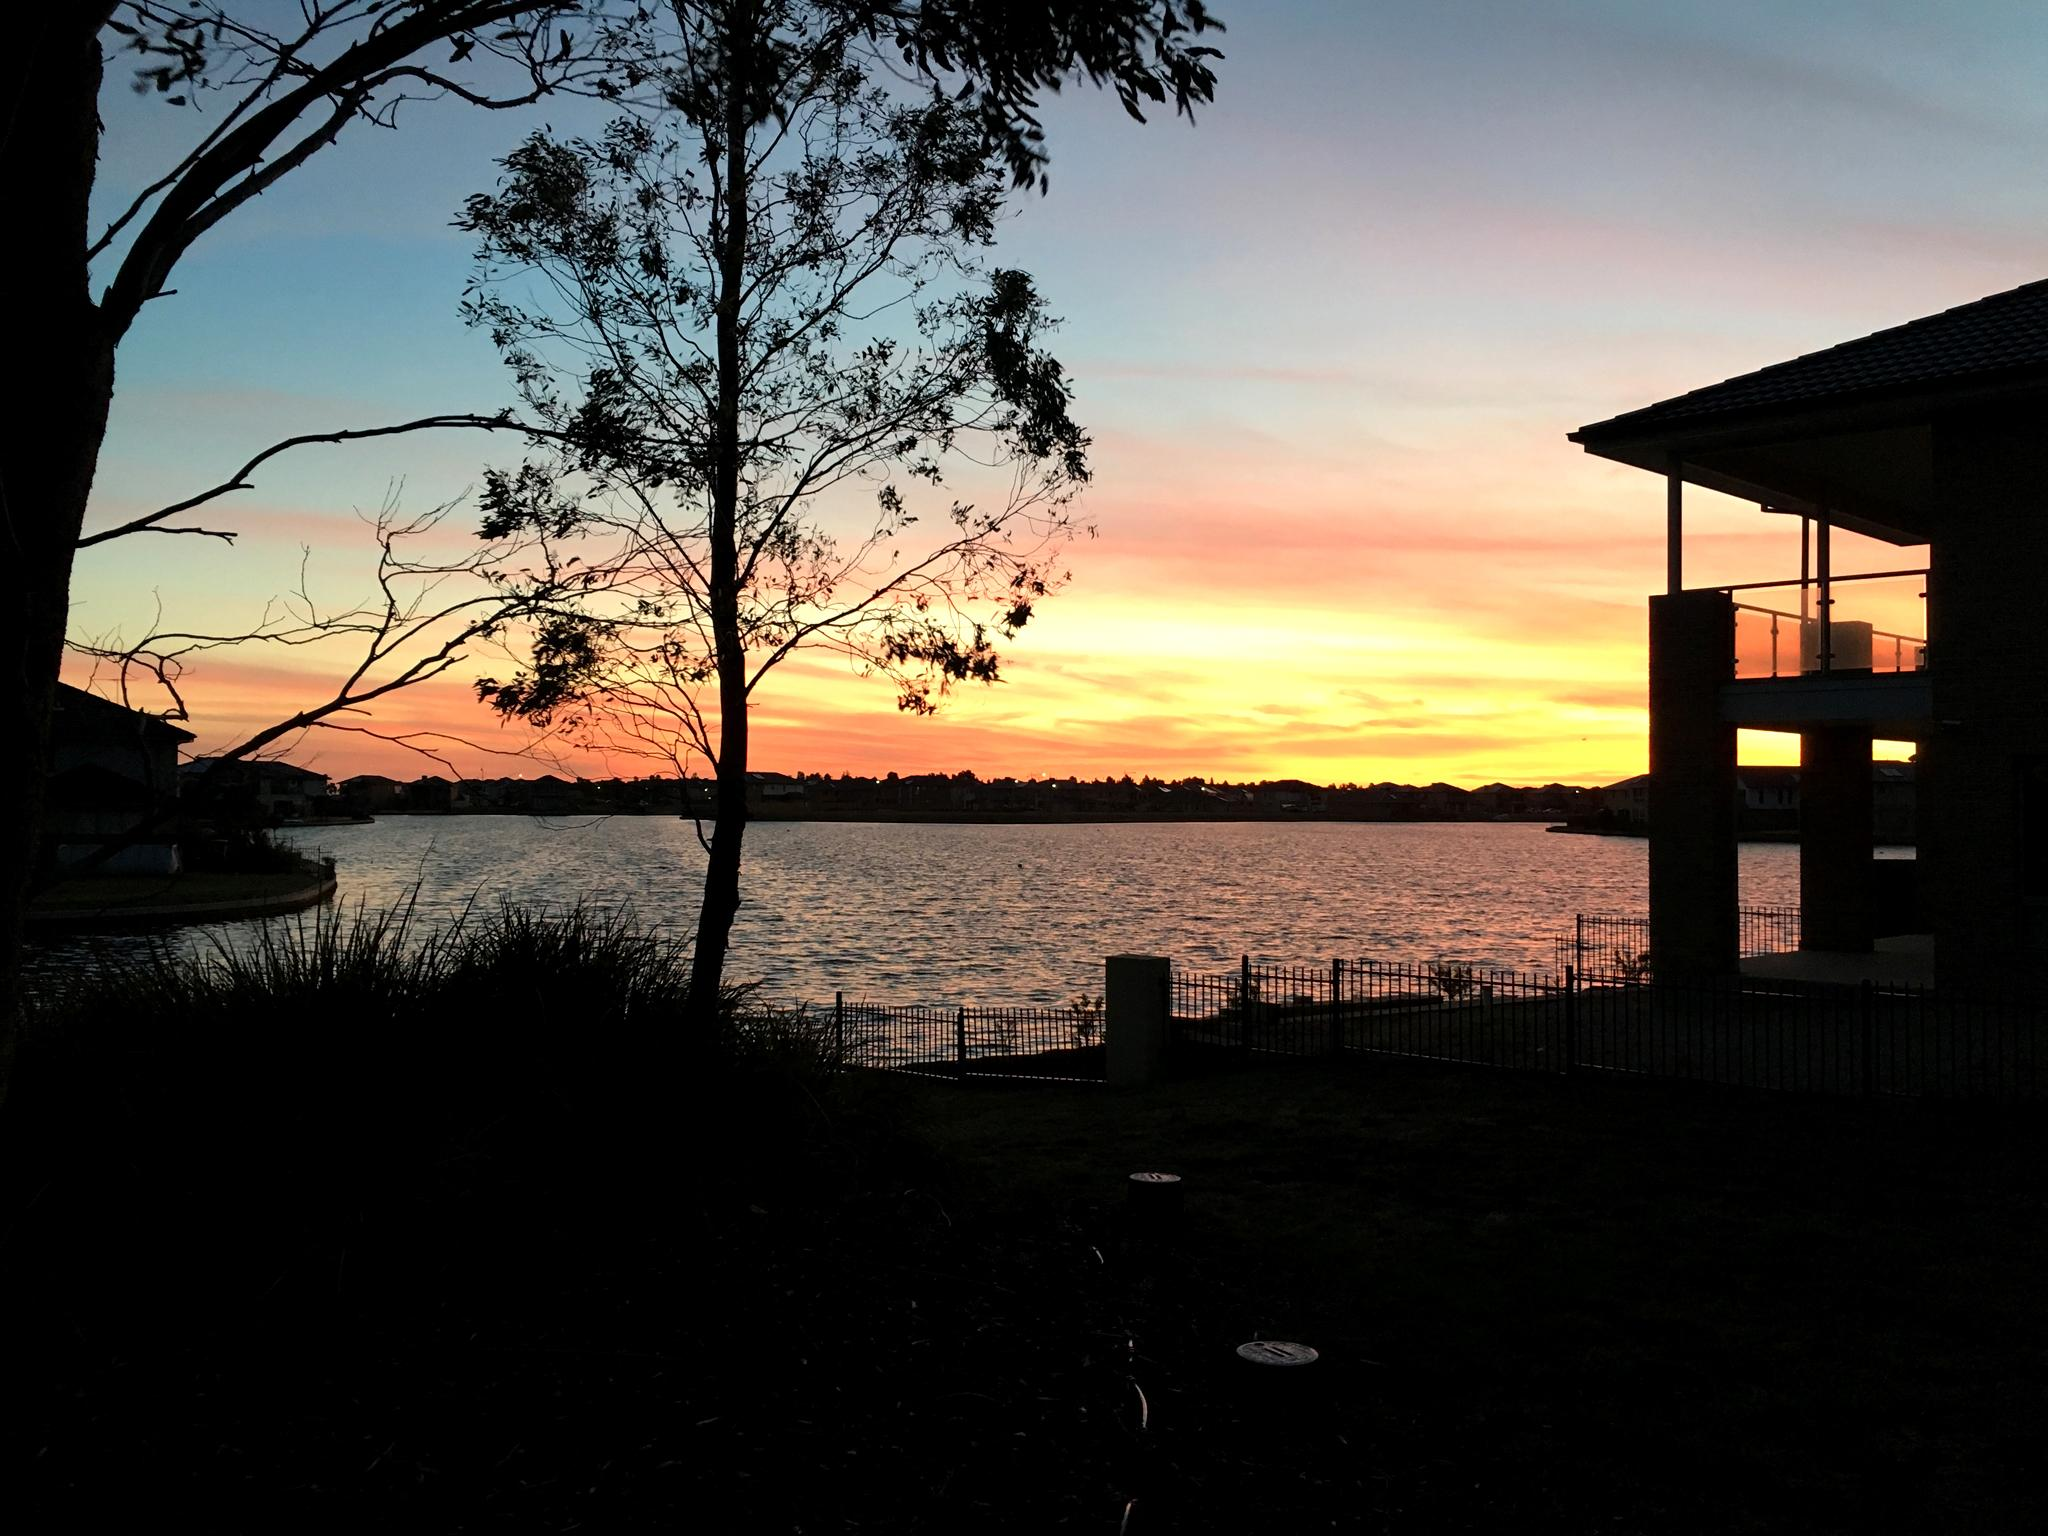 henrrison sanctuary lakes resort deluxe lake view house. Black Bedroom Furniture Sets. Home Design Ideas